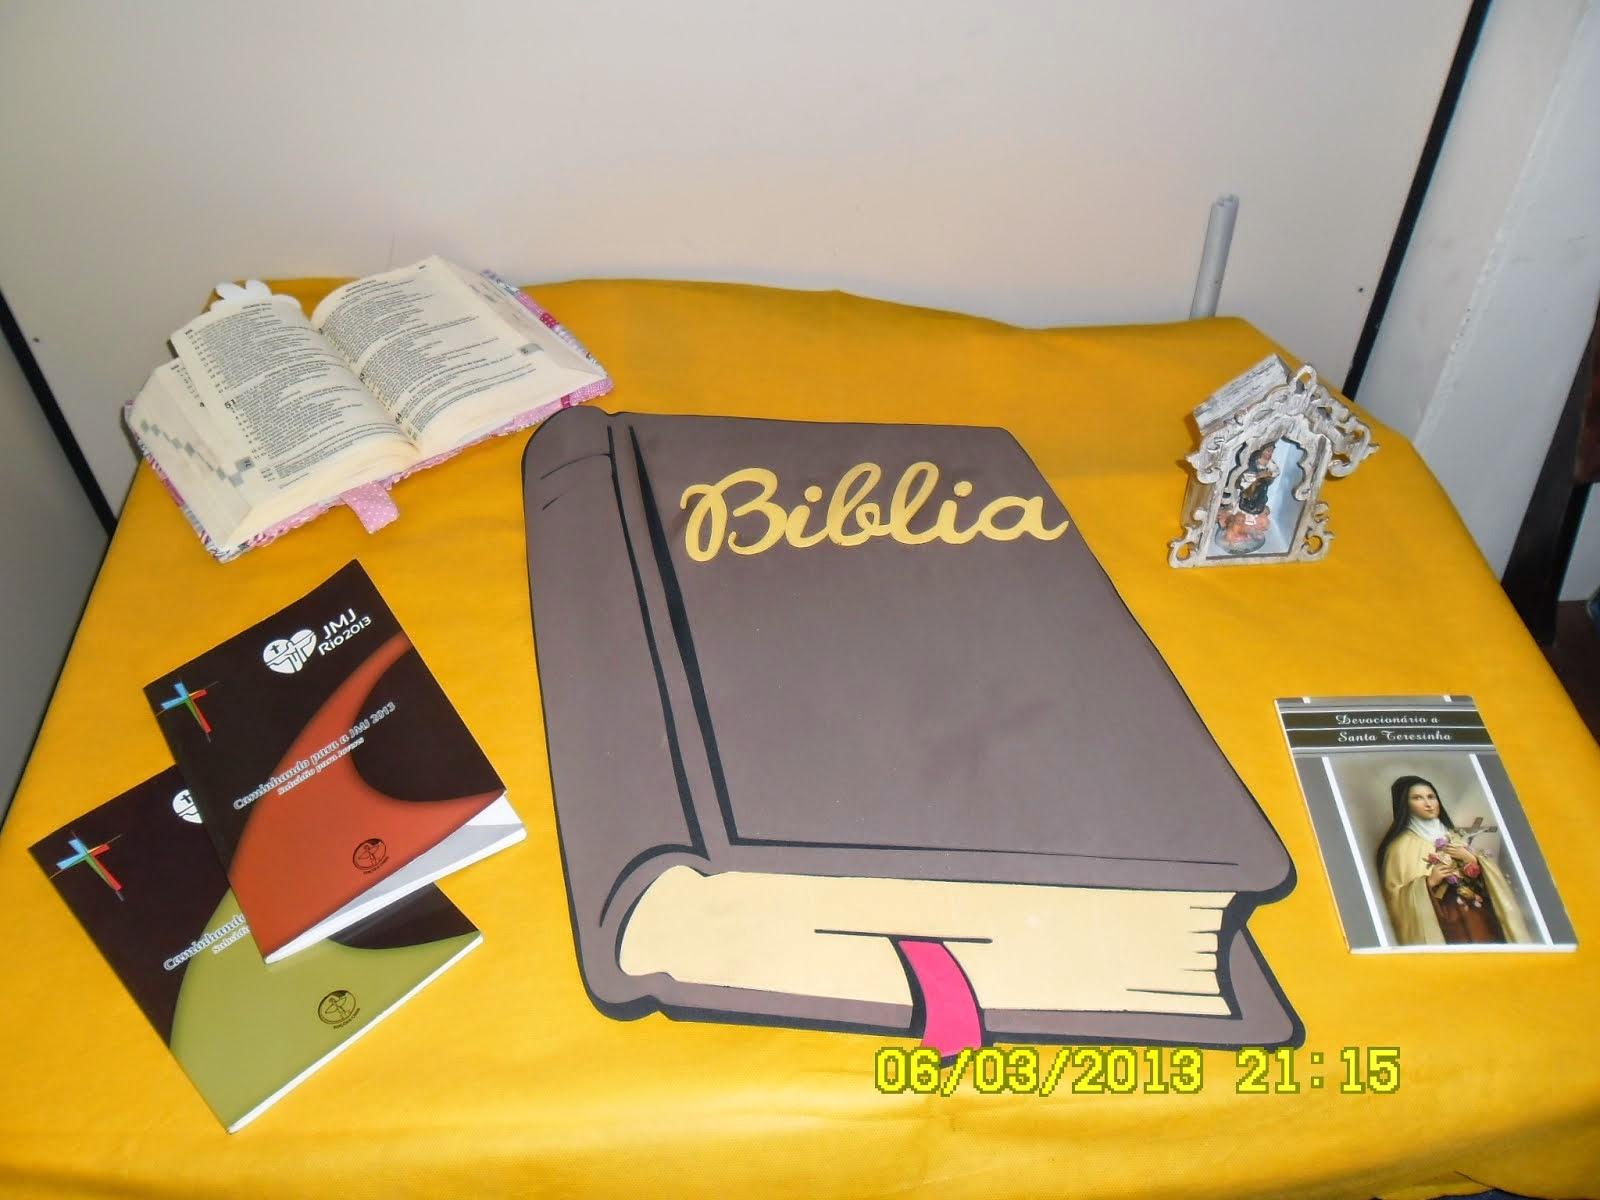 Bíblia, fonte importante na Catequese!